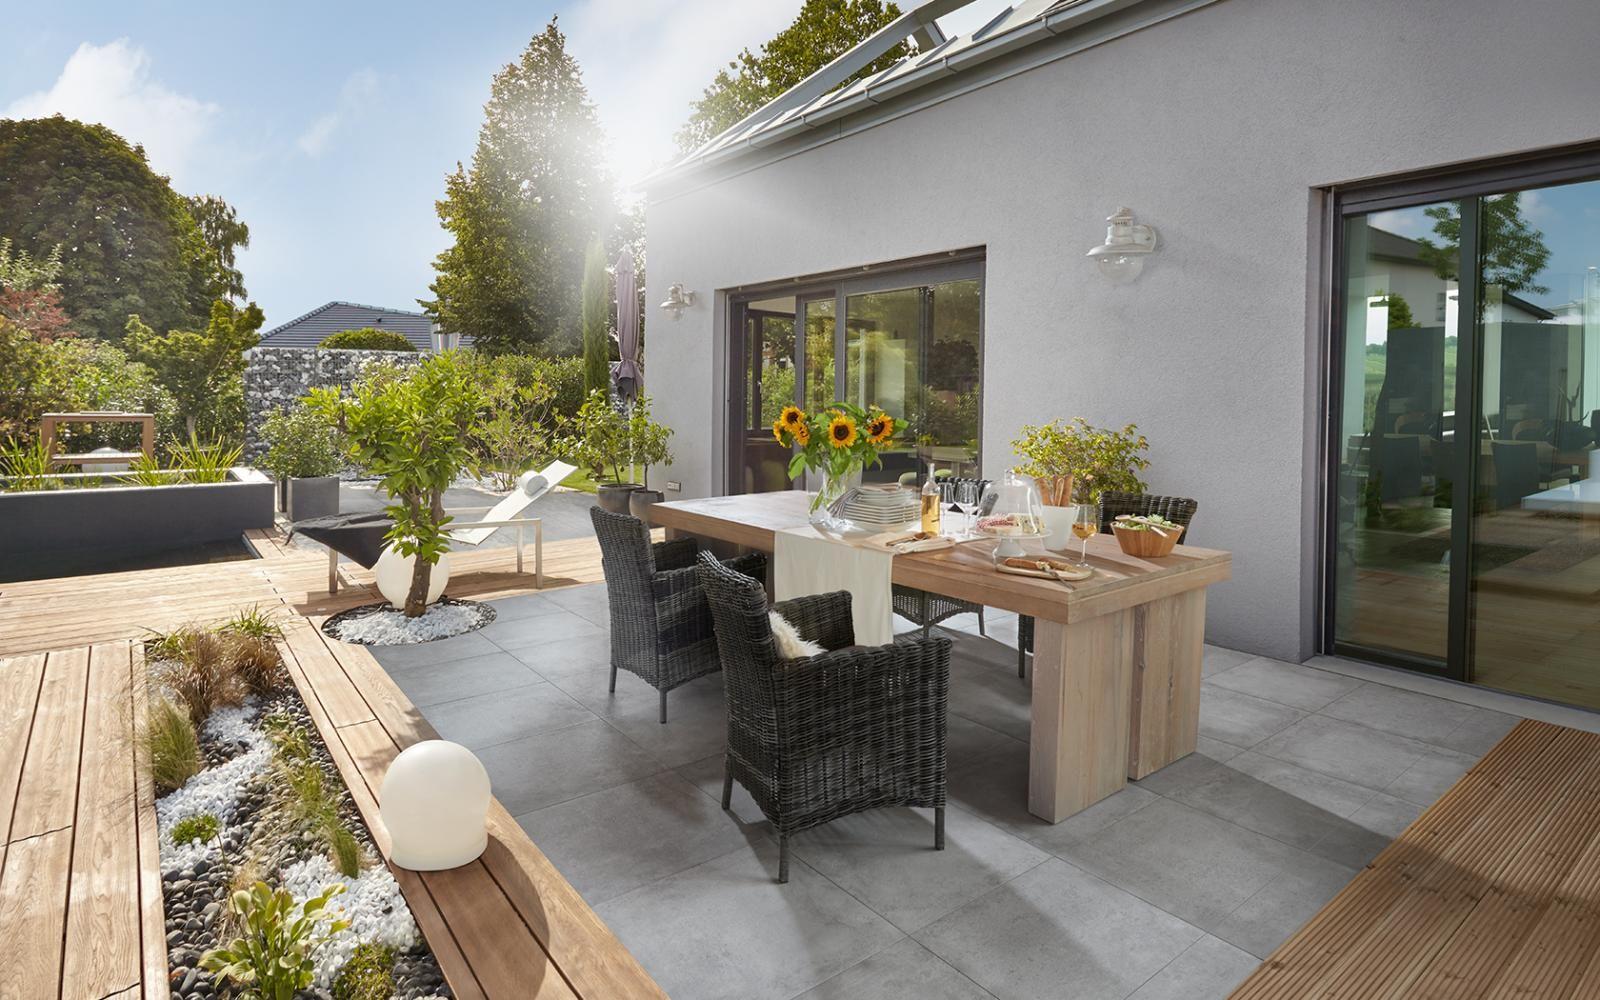 Beton   Aménagement jardin terrasse piscine, Patio en bois ...